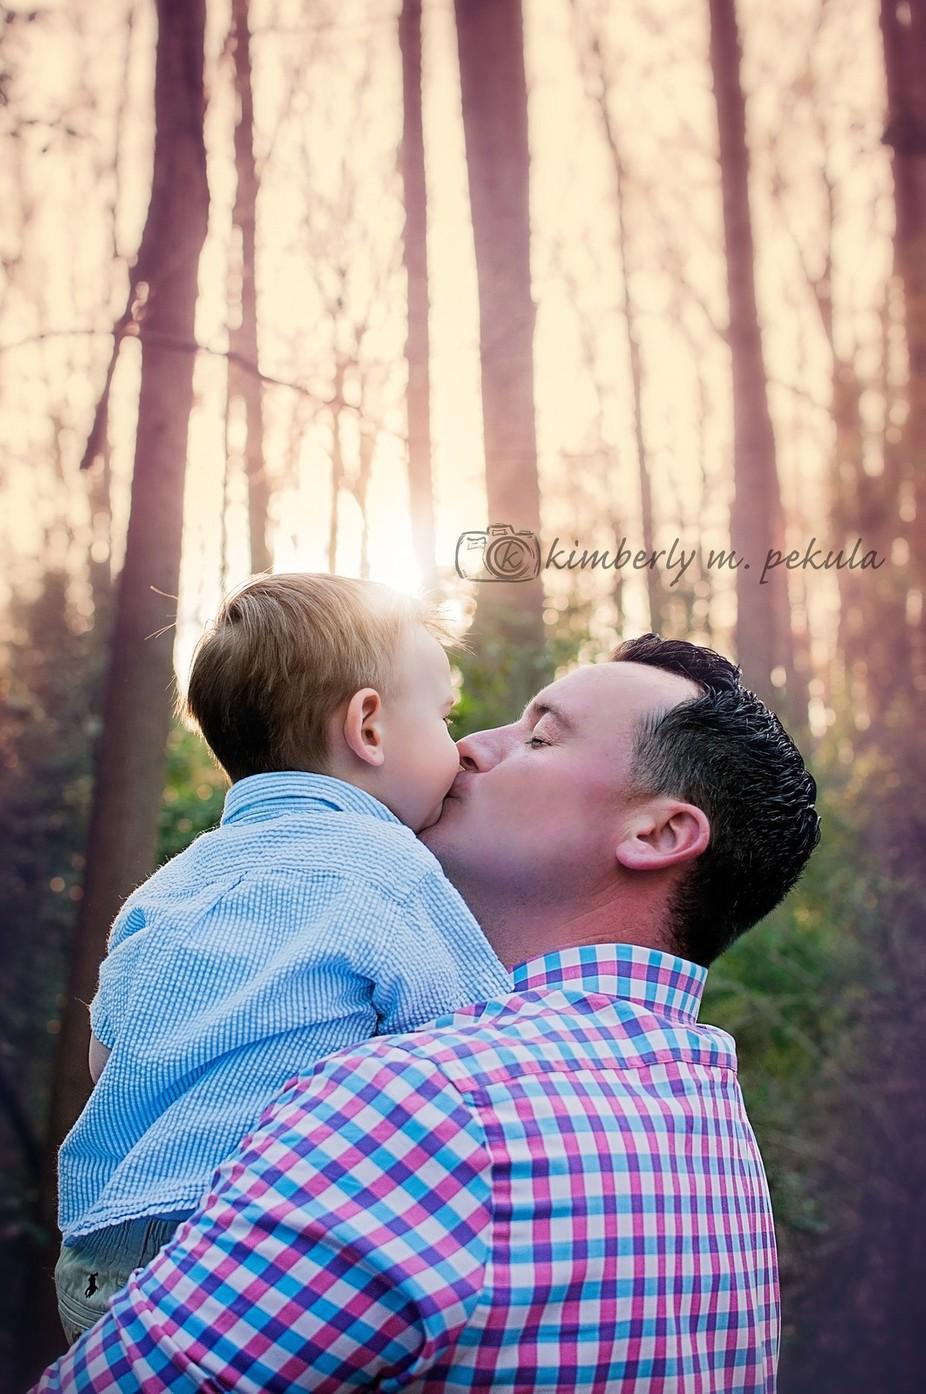 Lydzinski Family 2016_31 by kimberlypekula - 500 Dads Photo Contest